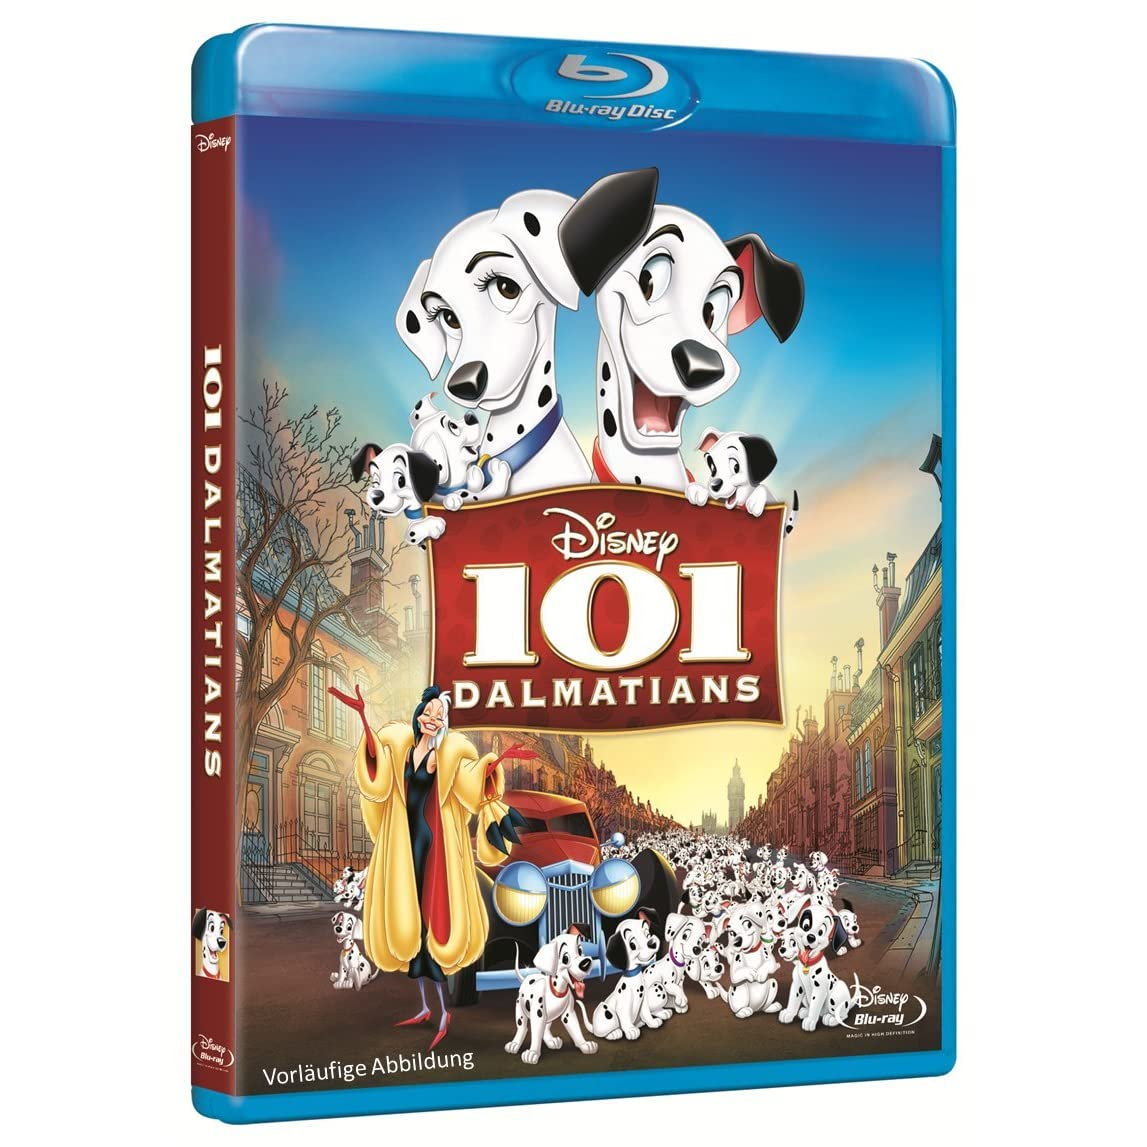 [BD + DVD] Les 101 Dalmatiens (8 août 2012) - Page 2 71JxUG6kpwL._AA1147_